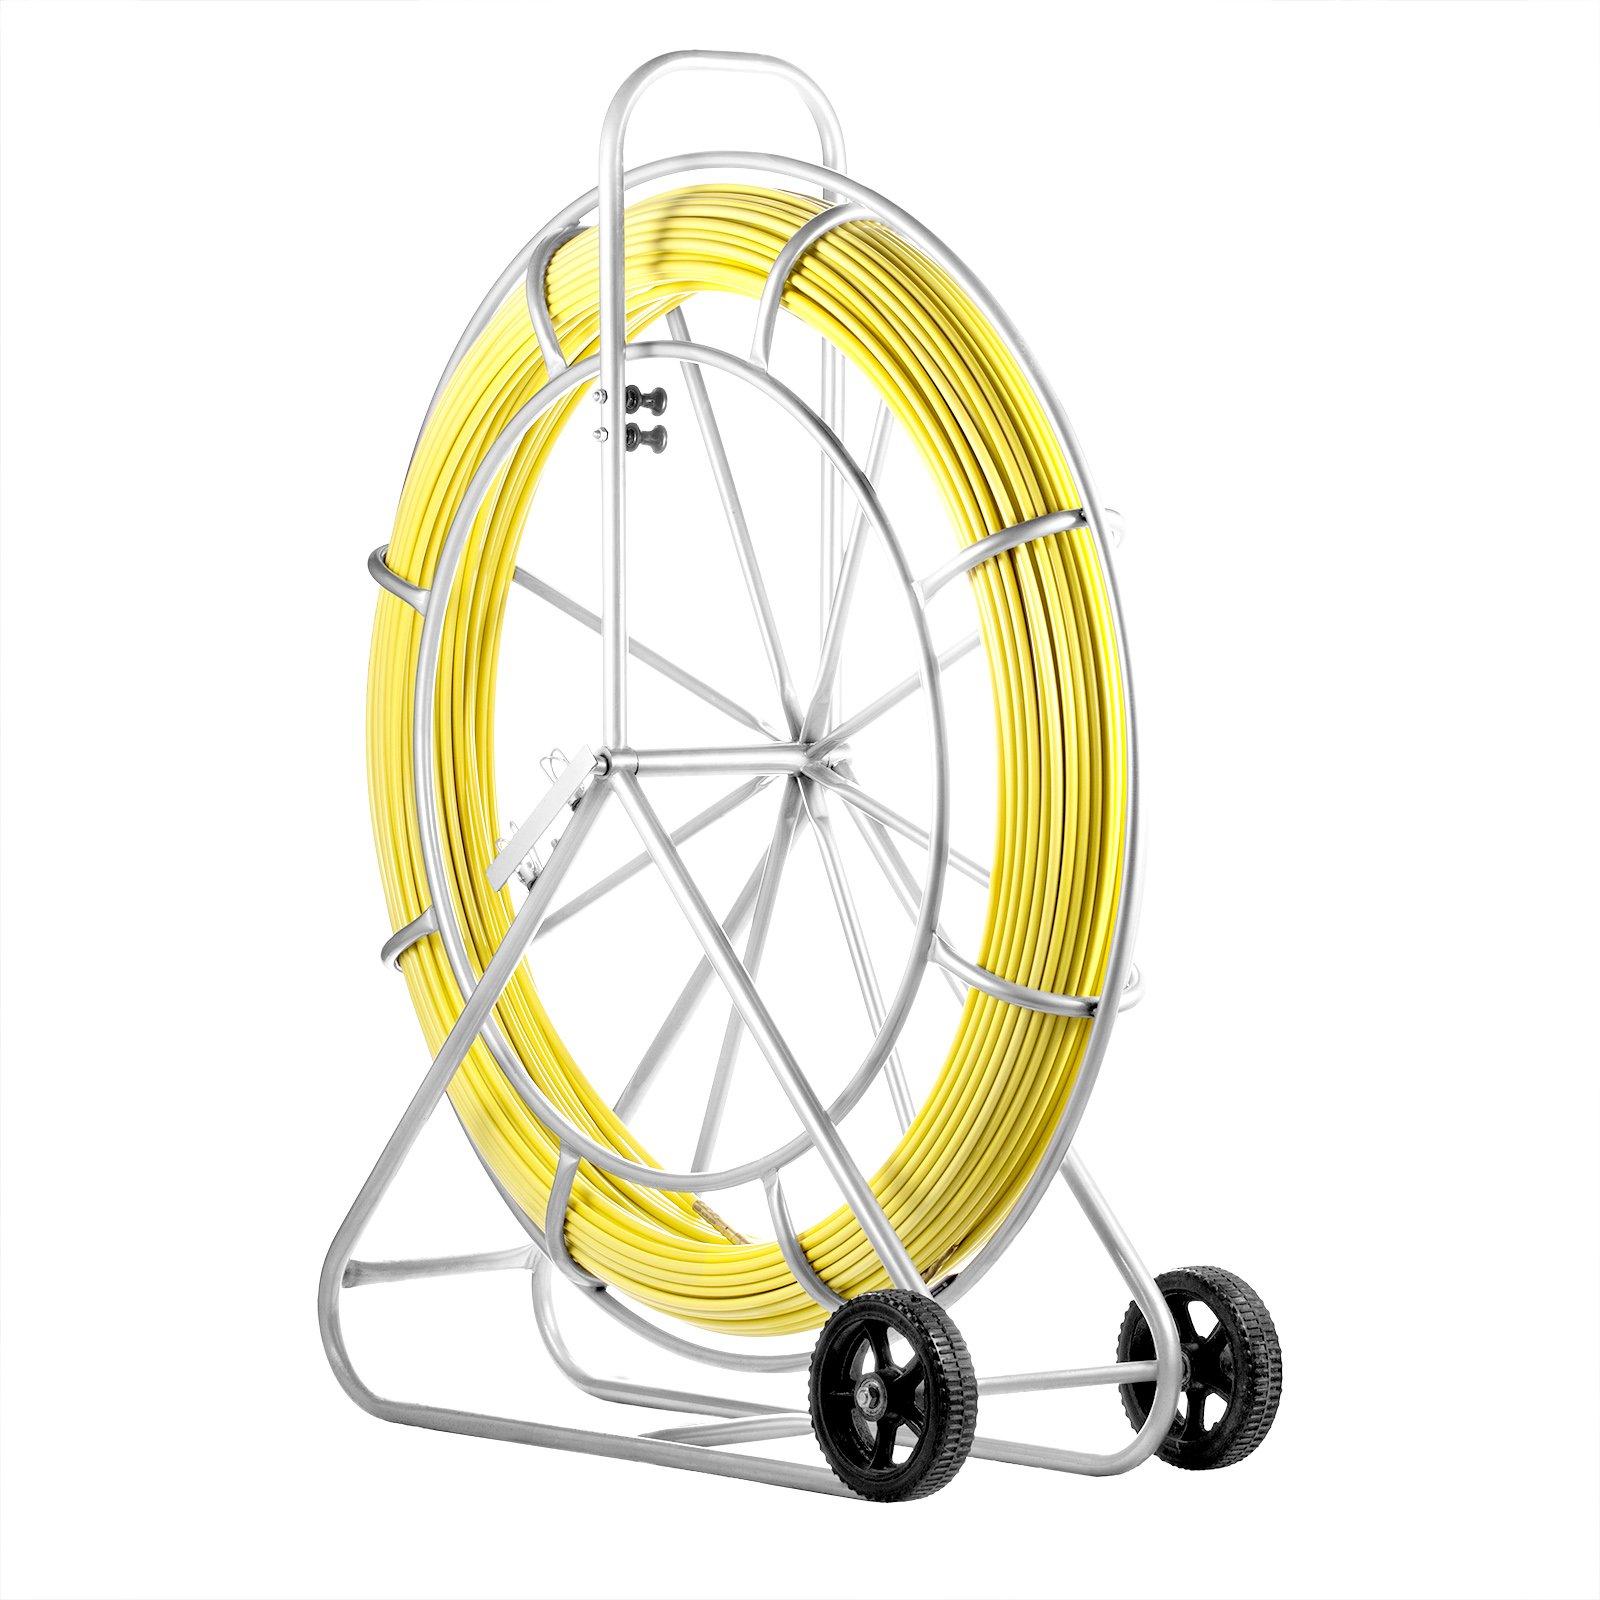 SucceBuy Fish Tape Fiberglass 12MM Fiberglass Wire Cable 820FT Fish Tape Fiberglass Wire Running Duct Rodder by SucceBuy